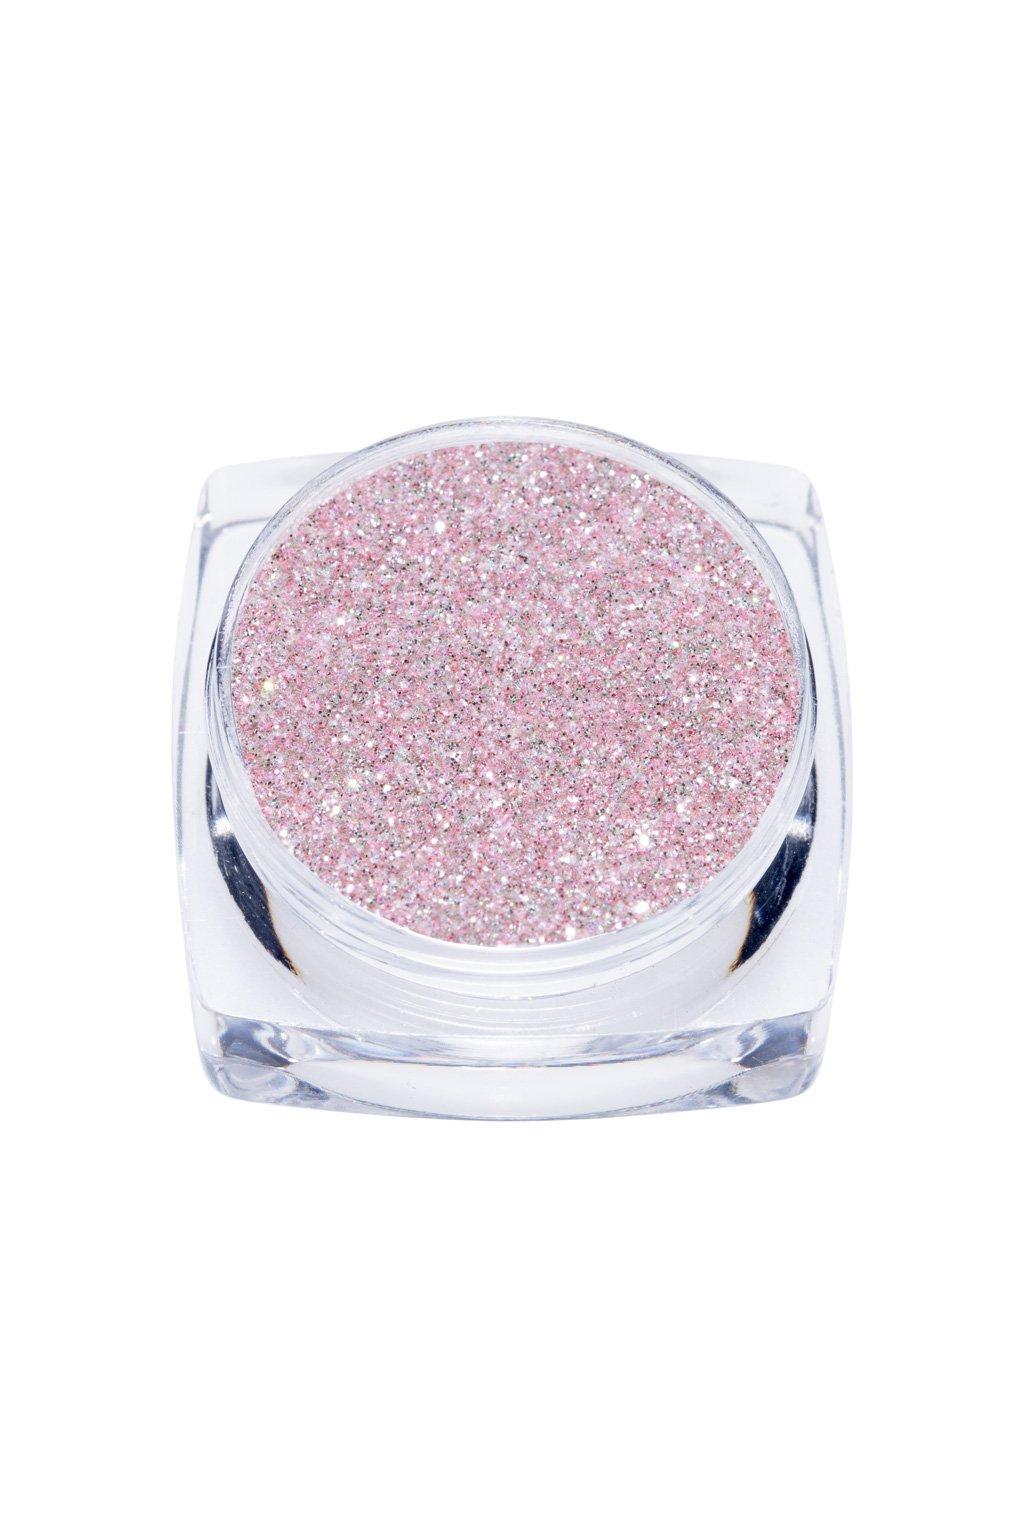 23558 sparkling mix princess